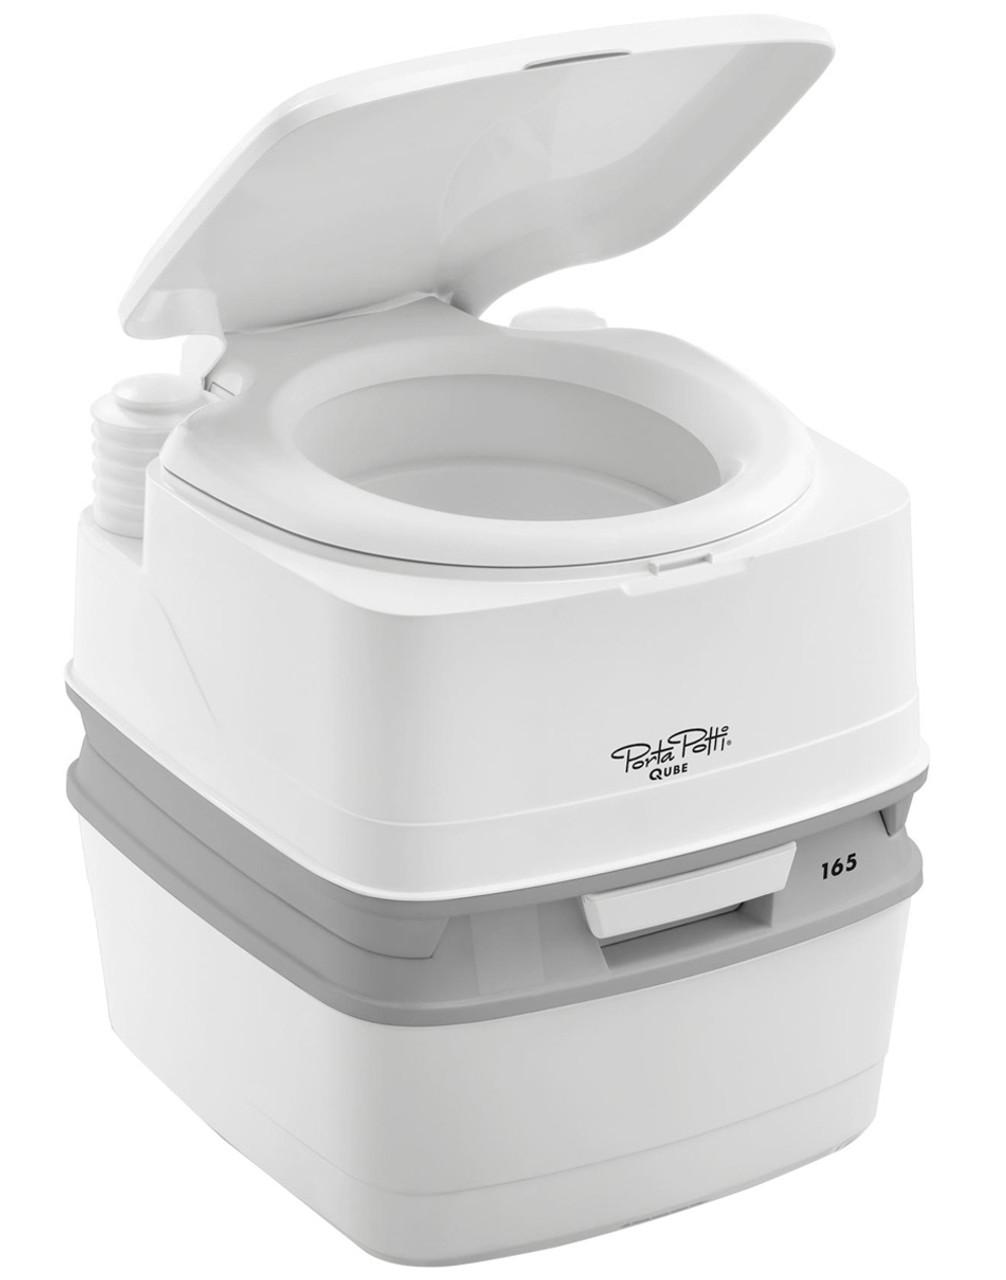 Thetford Porta Potti Qube 165 Chemical Camping Toilet